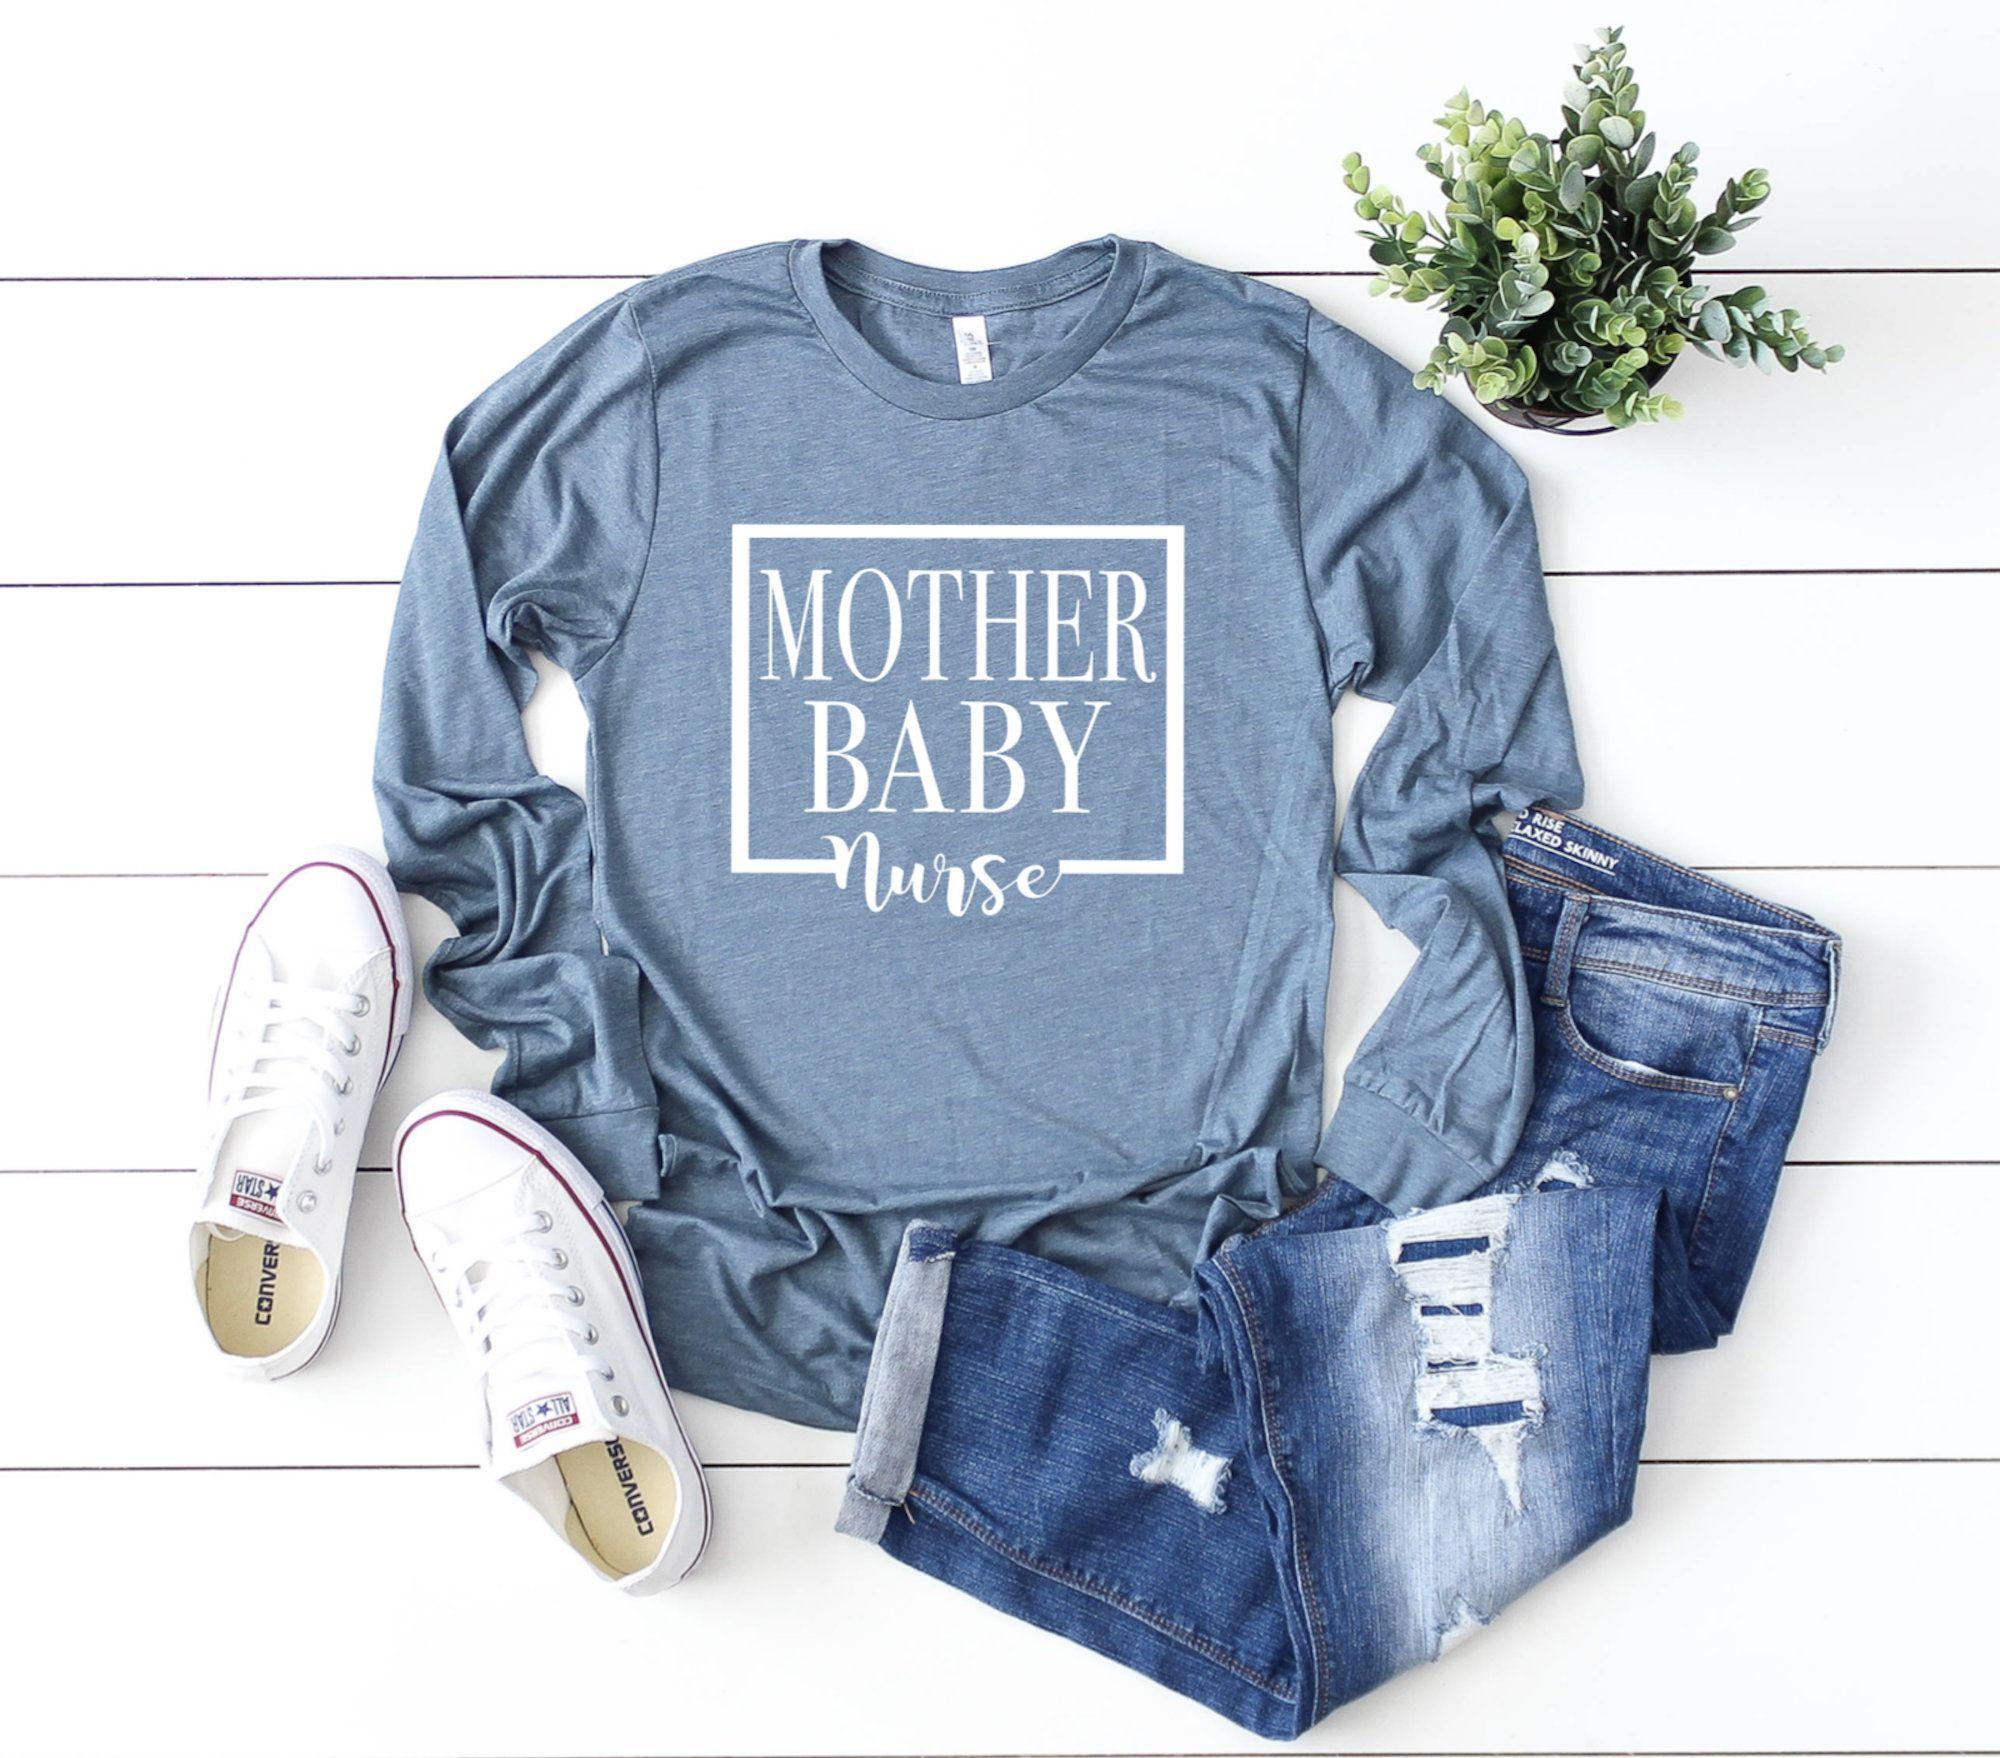 Nurse Shirts Mother Baby Nurse Baby Nurse Shirt Ob Nurse